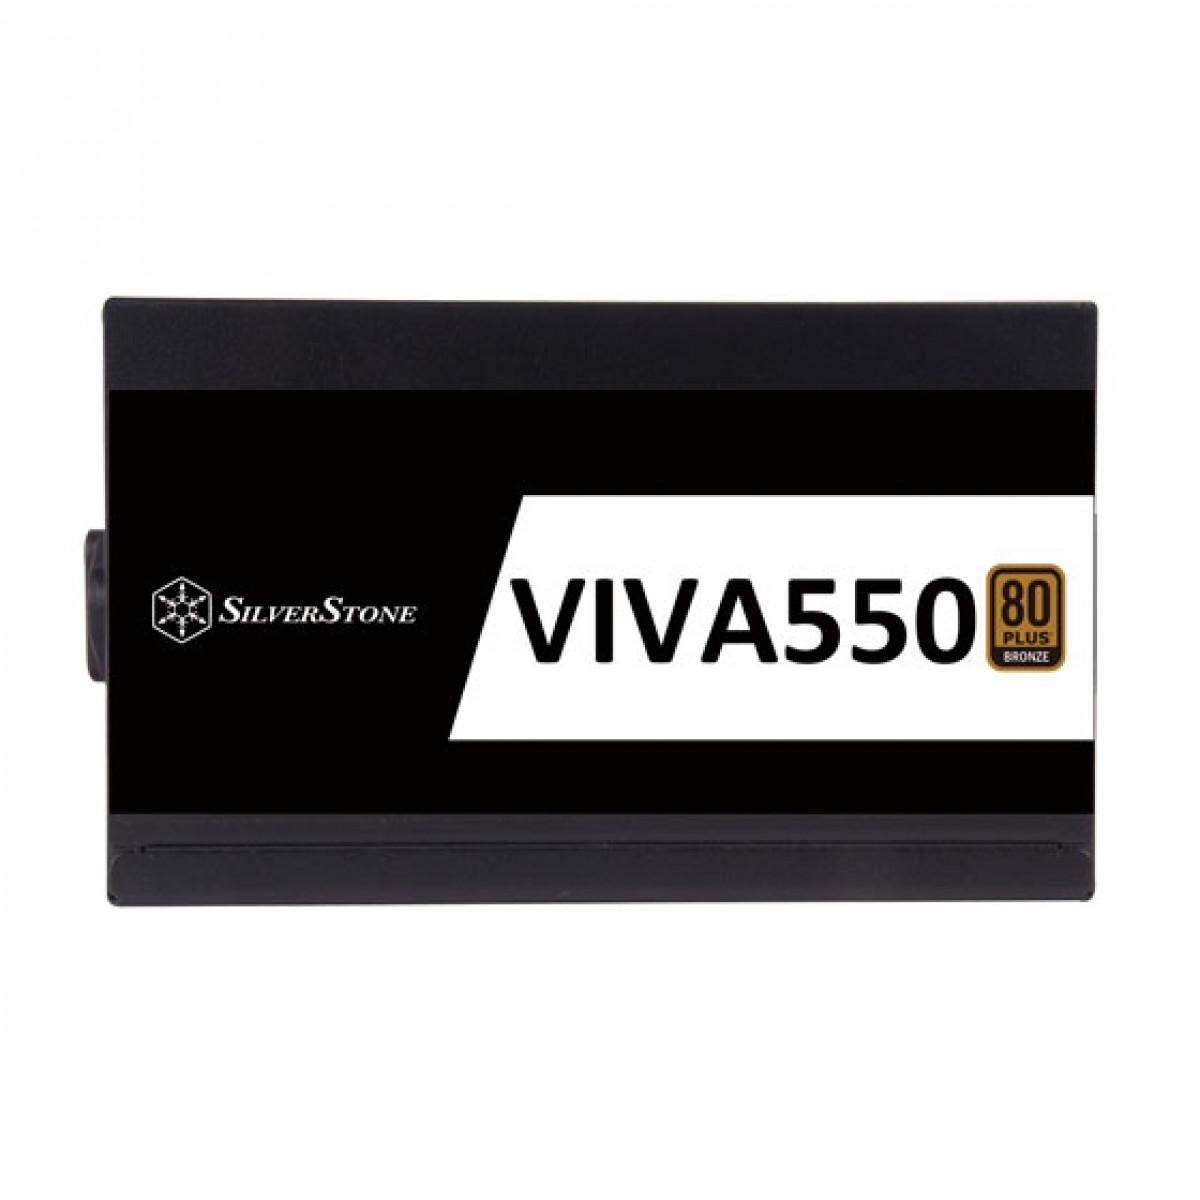 Fonte SilverStone VIVA 550, 550W, 80 Plus Bronze, PFC Ativo, SST-VA550-B